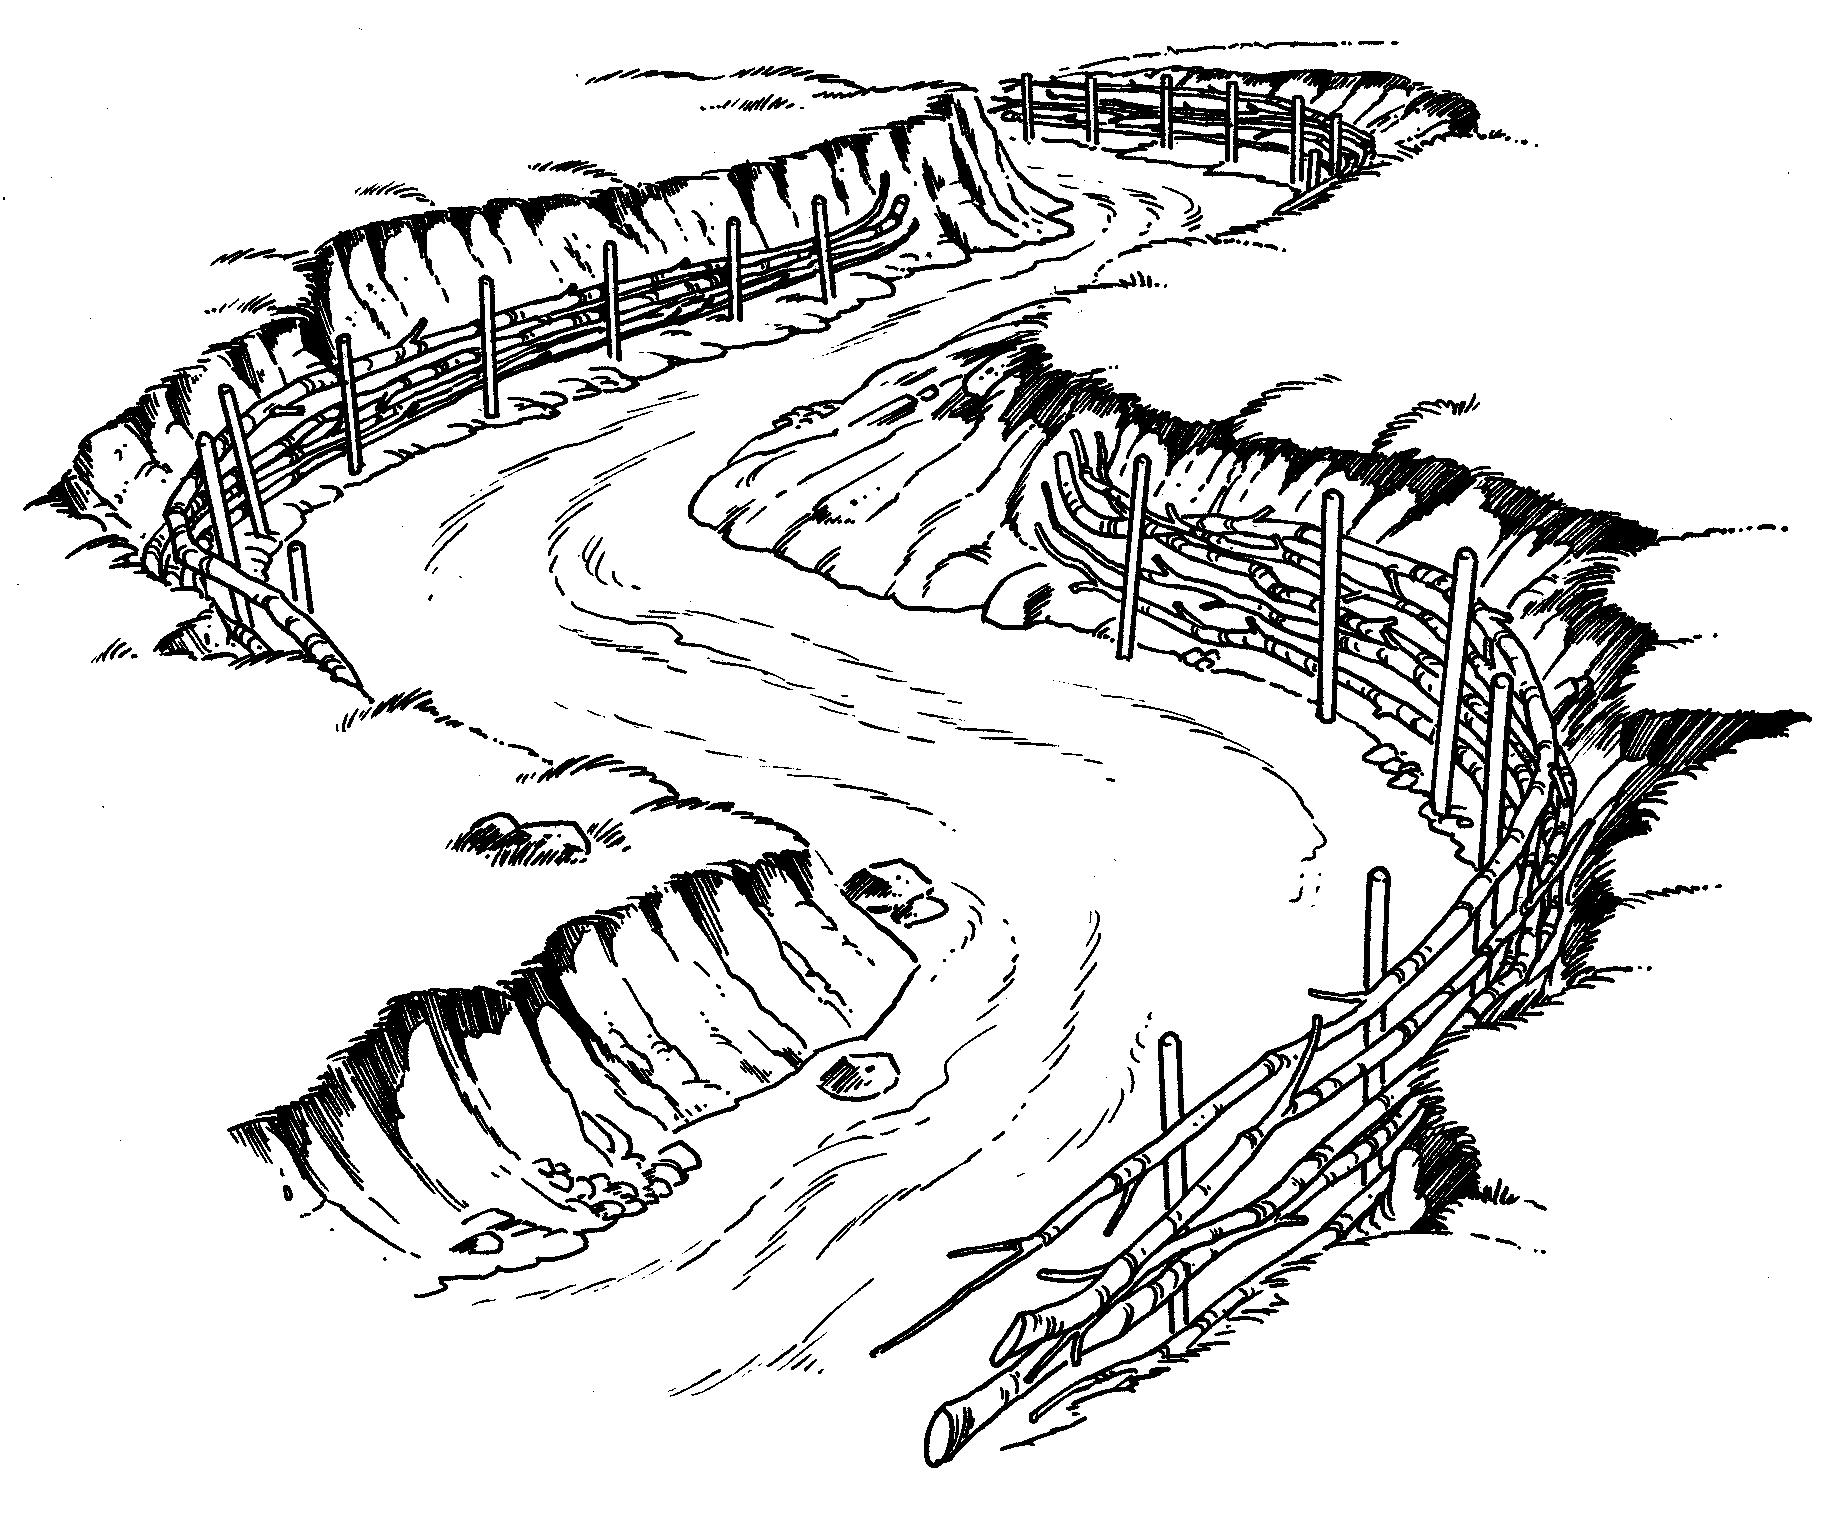 1832x1518 Soil Bioengineering For Land Restoration And Slope Stabilization